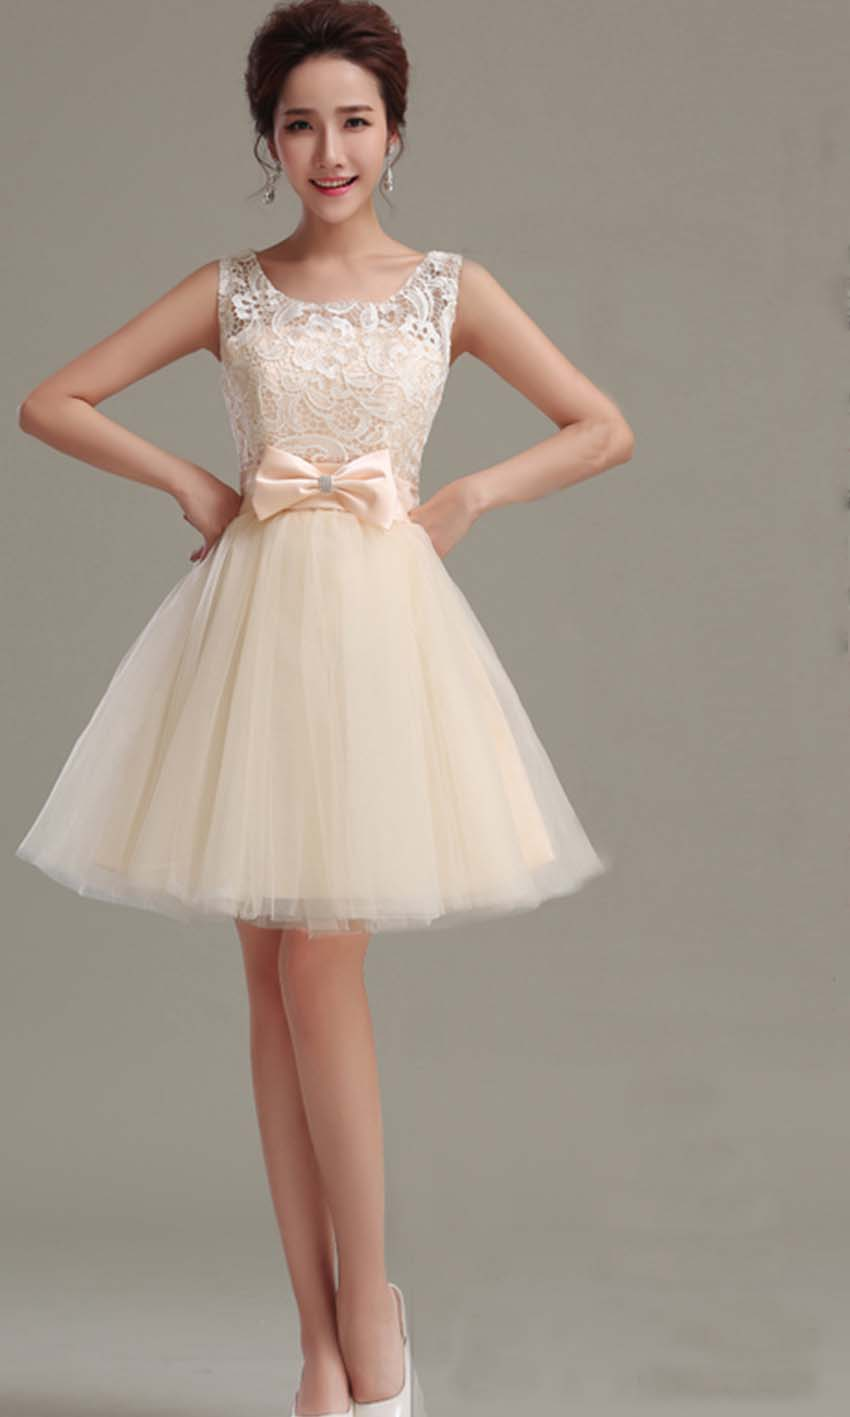 Cute Beige Retro Bow Knot Short Prom Gown KSP348 [KSP348] - £86.00 ...